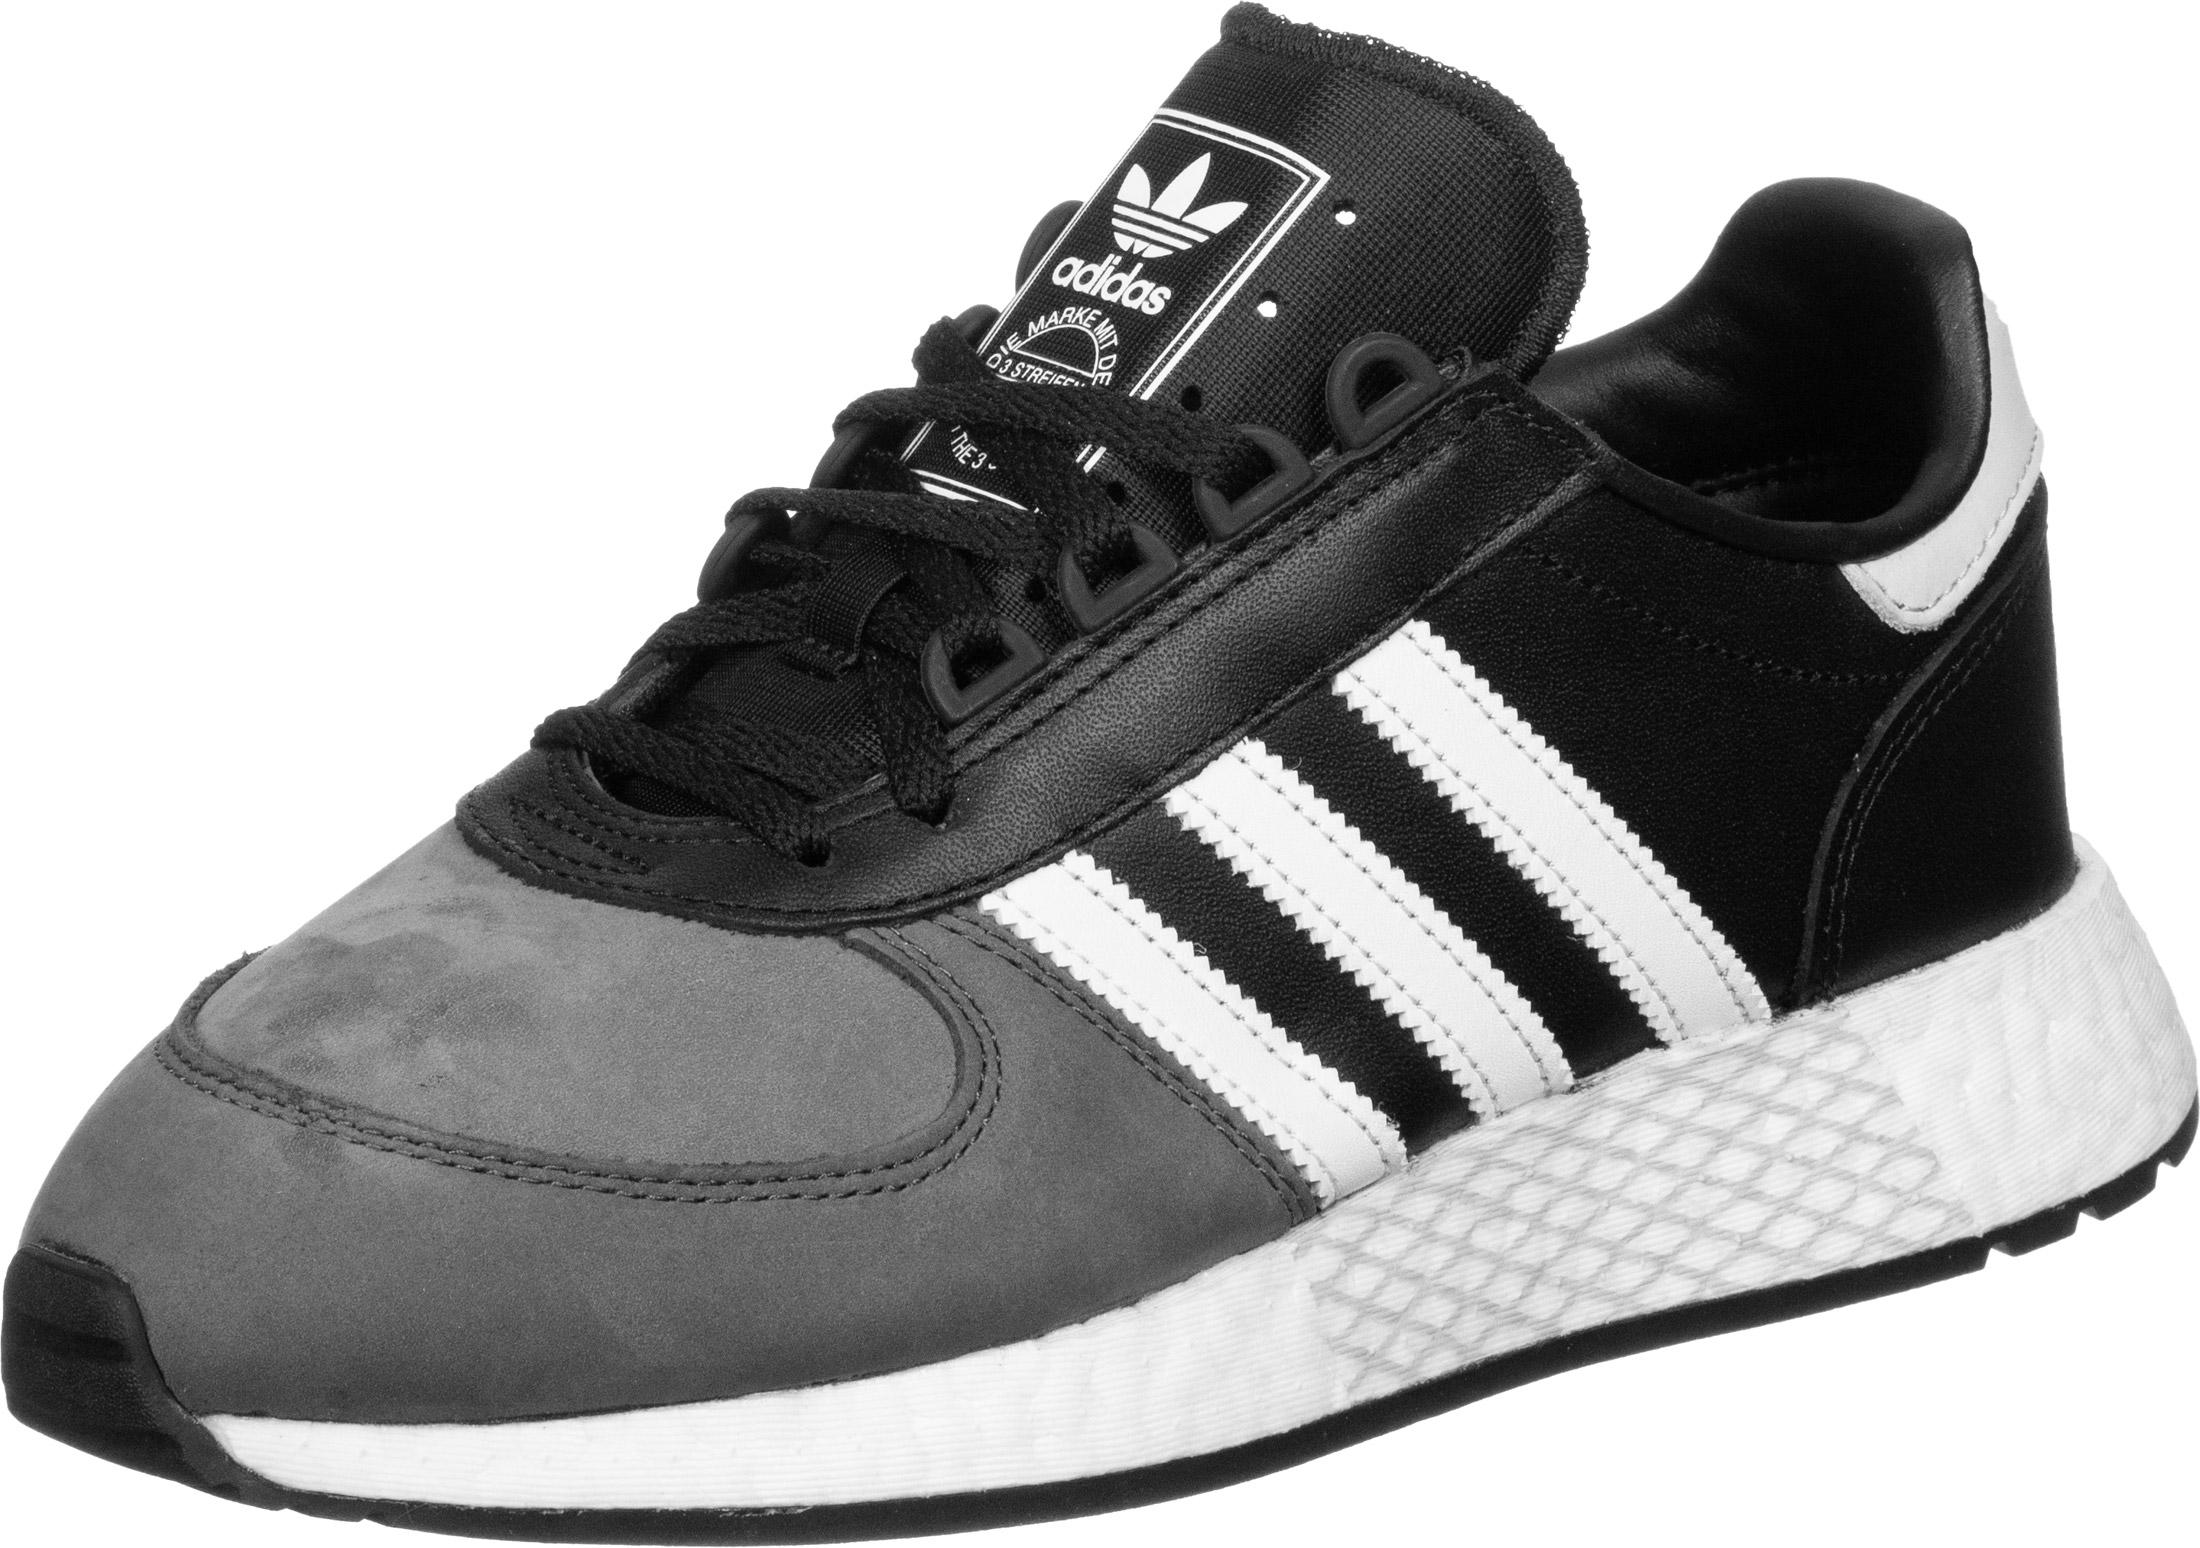 chaussure adidas 10k noire